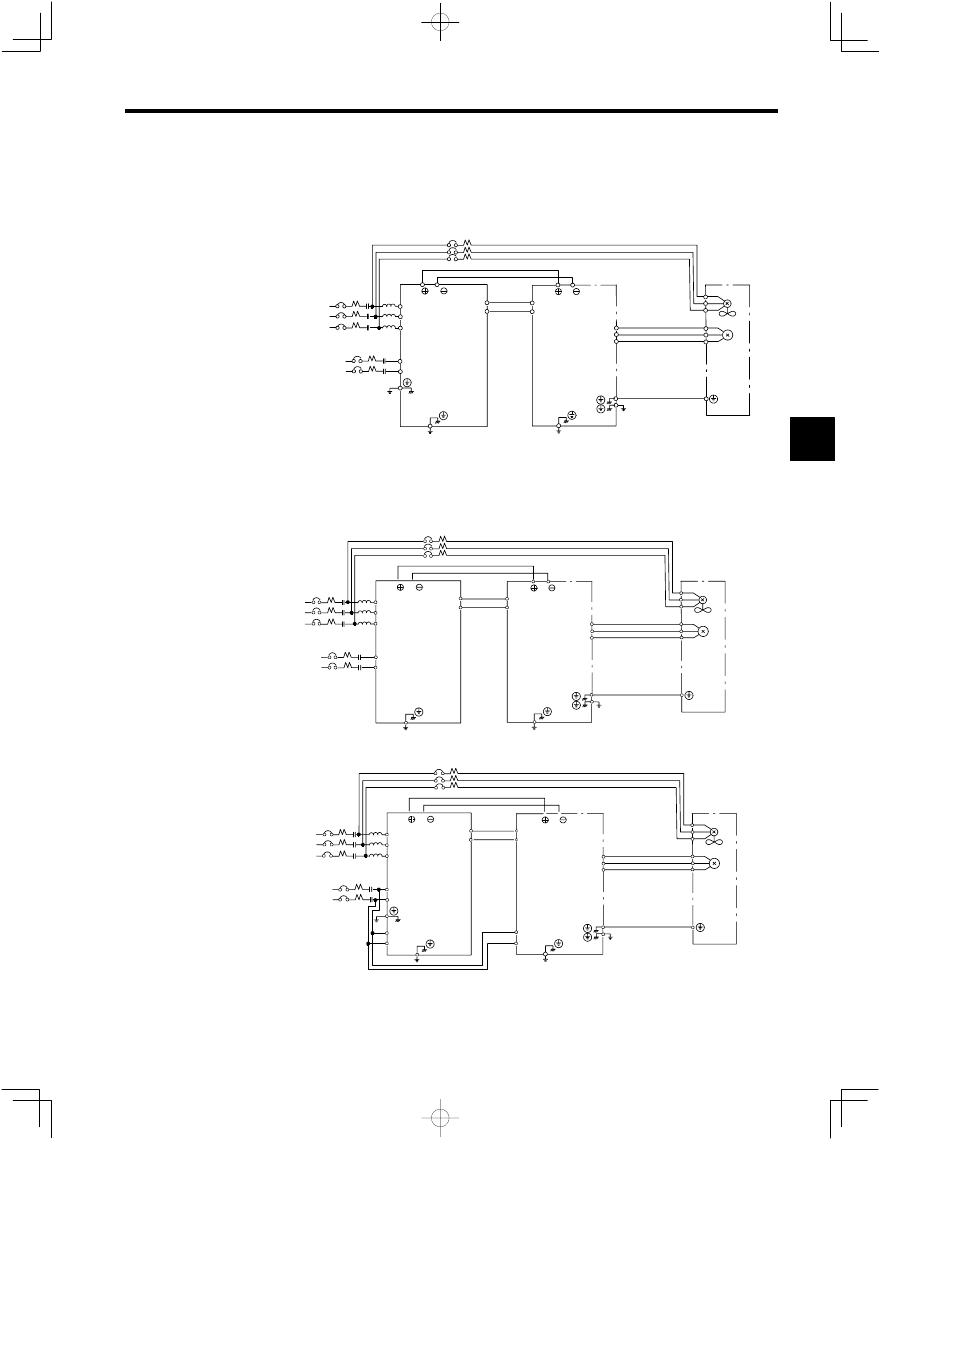 4 Main Circuit Connection Diagrams  200 V Class External